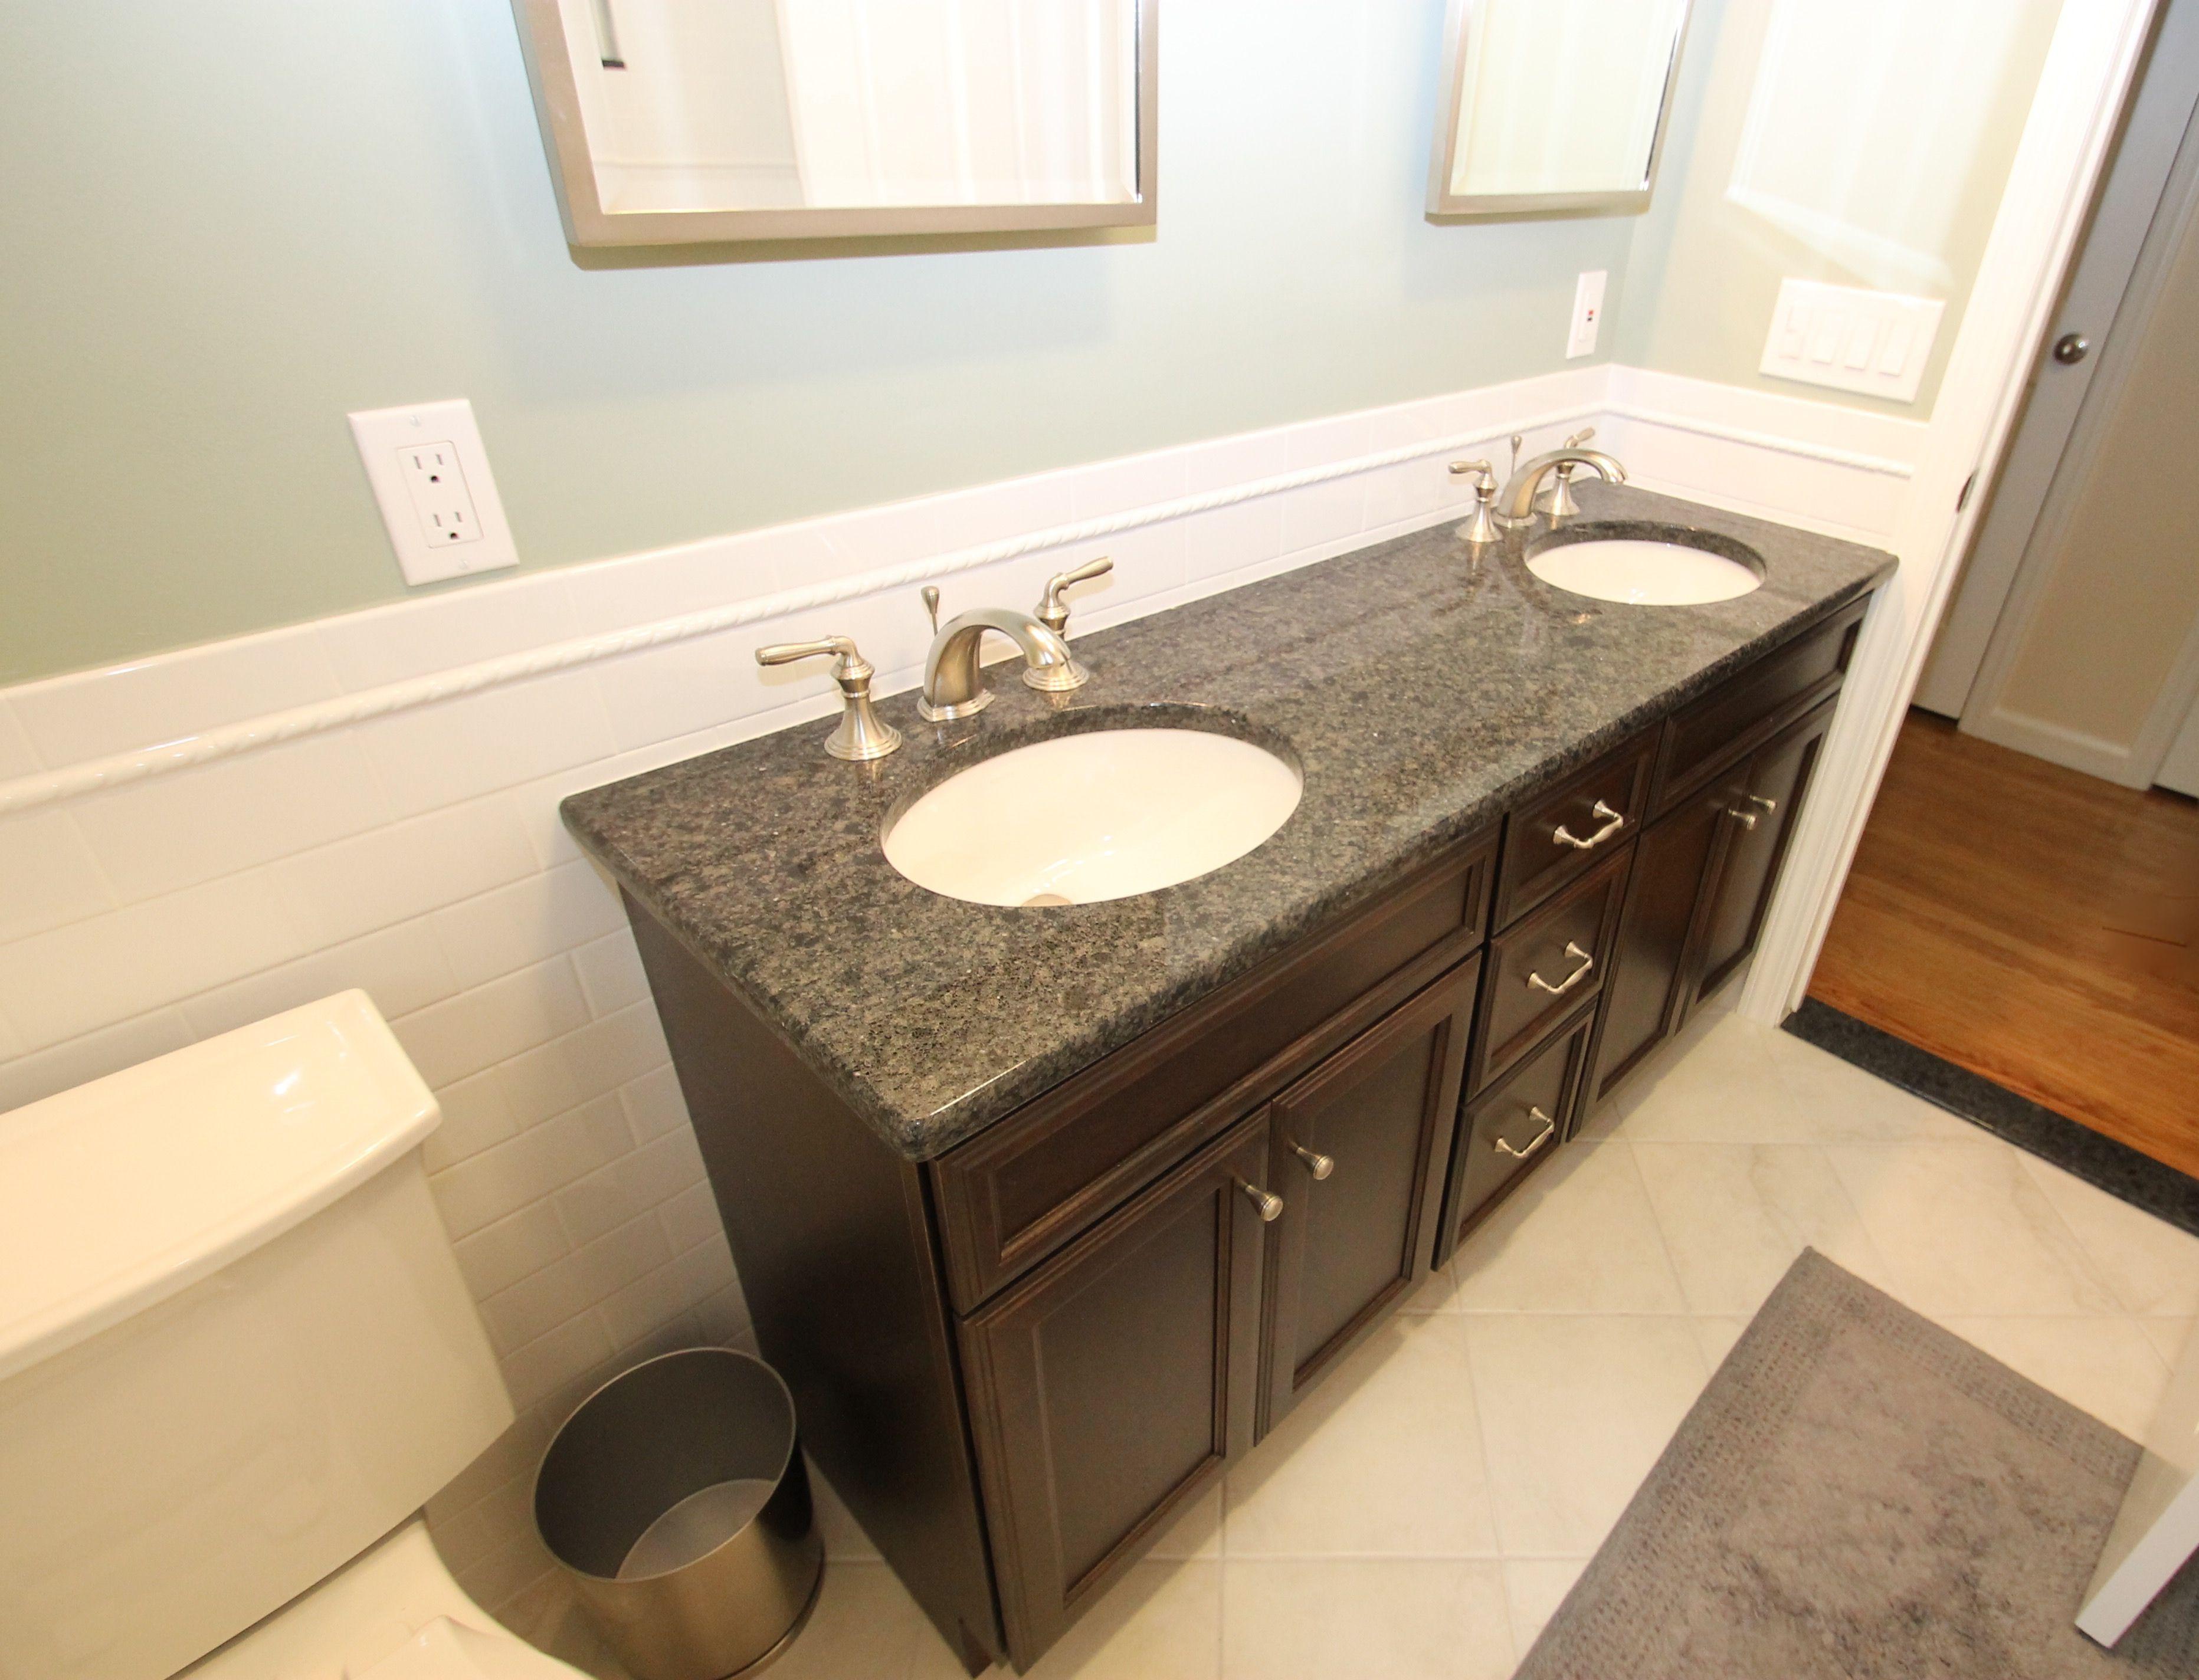 Kitchen Remodeling NJ, Bathroom Design New Jersey, Kitchen U0026 Bath  Remodeling Contractor Services By NJ Kitchens U0026 Baths Offers Bath  Remodeling, Kitchen